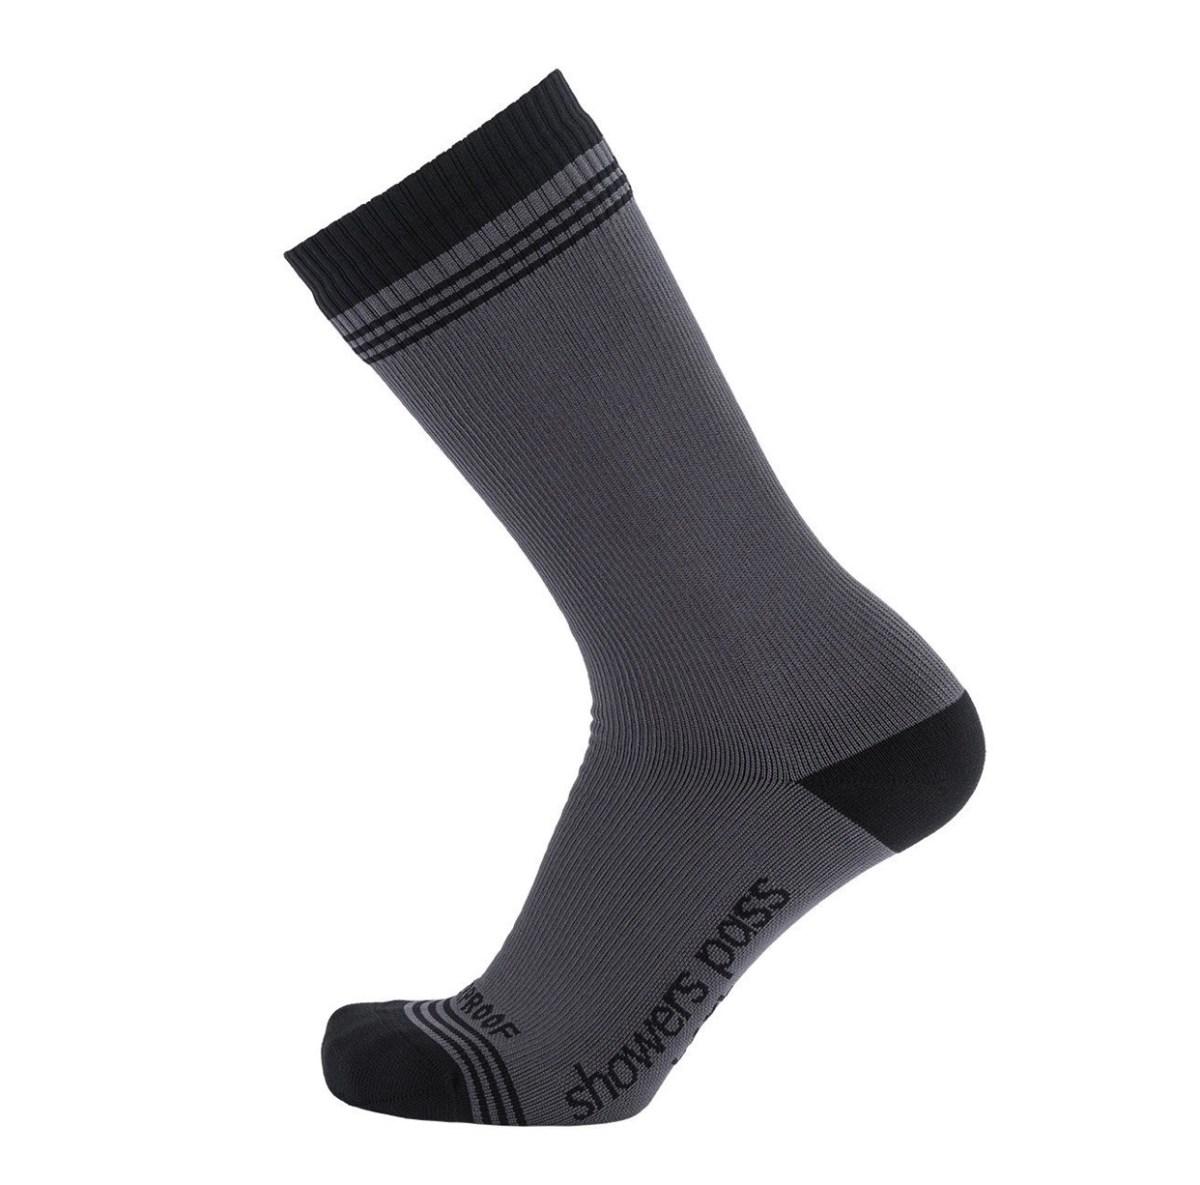 Shower's Pass Sock